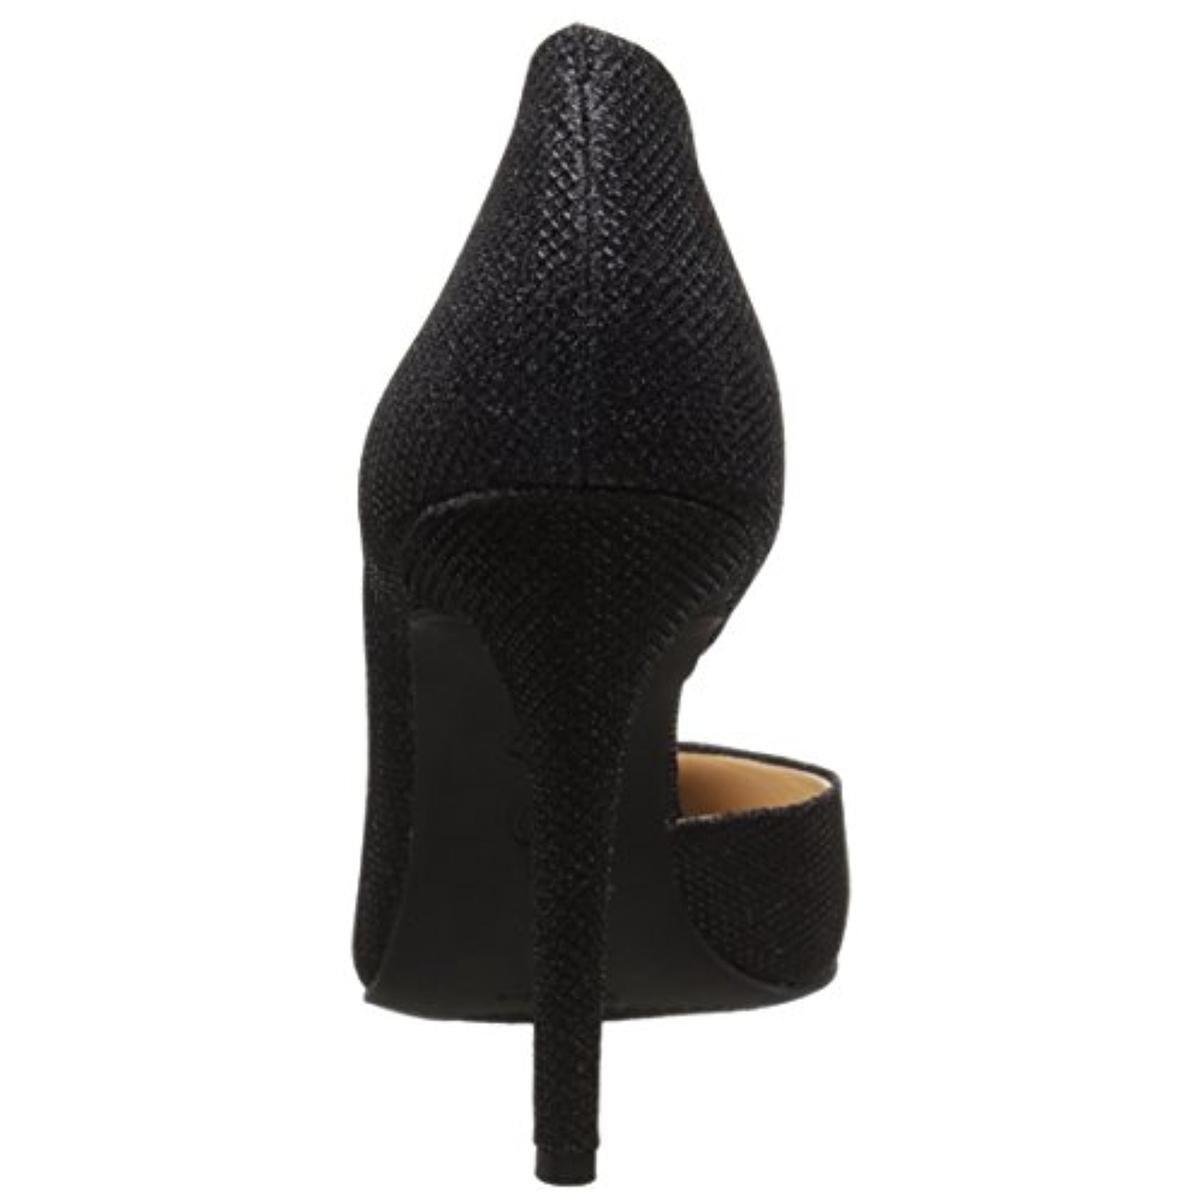 8c953ebbb9f Jessica Simpson Womens Claudette D'Orsay Heels